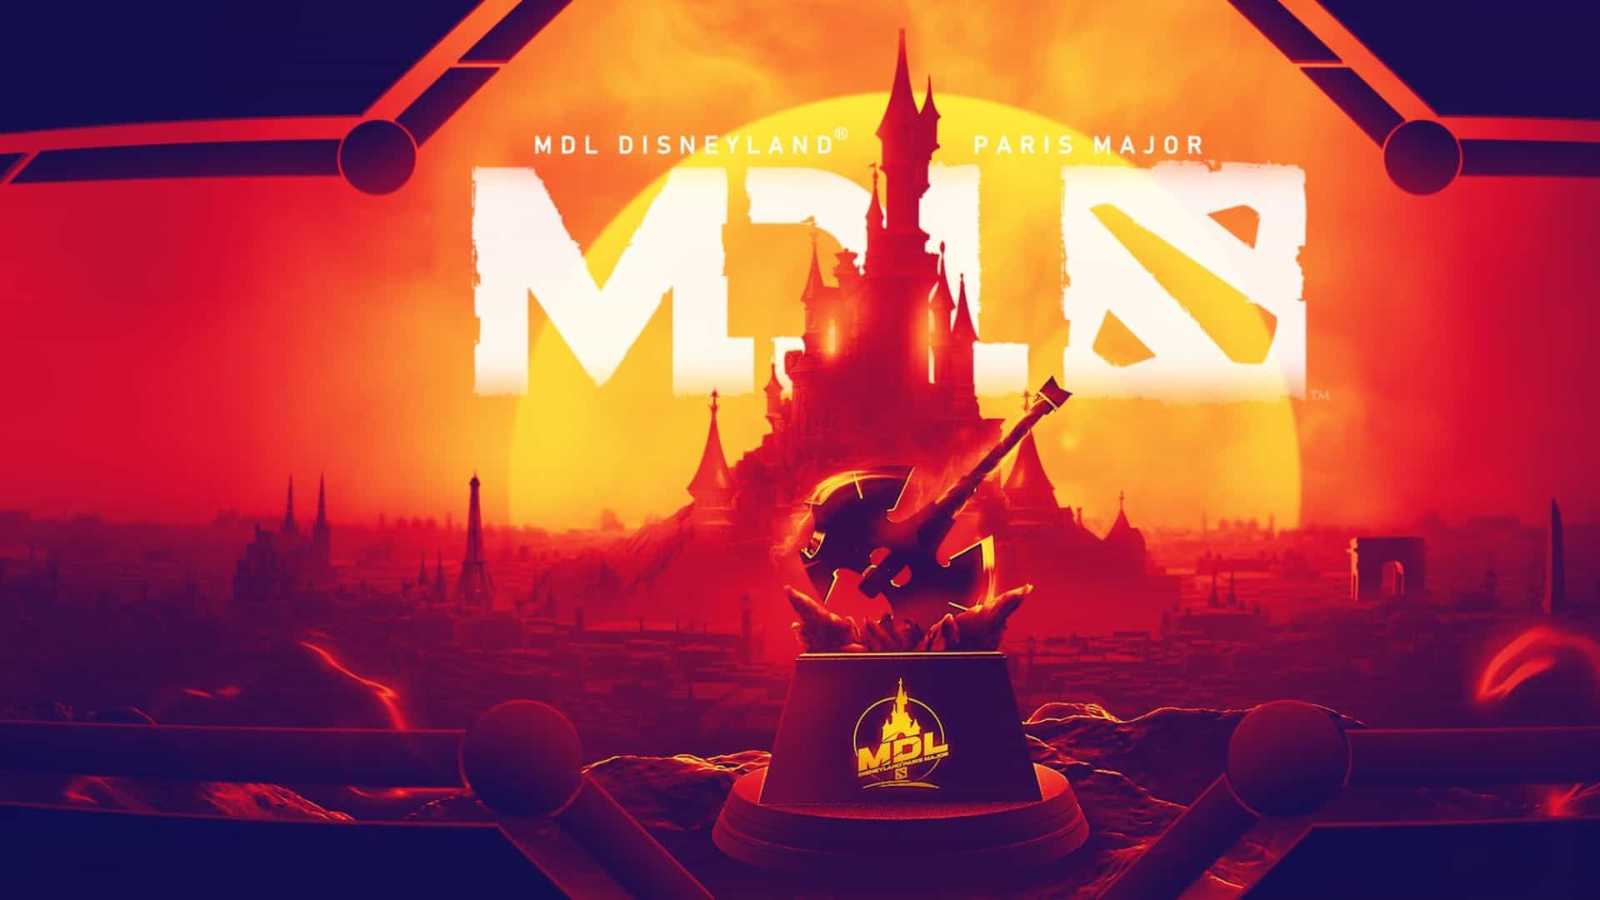 Dota 2 MDL Disneyland Paris Tournament Preview 1